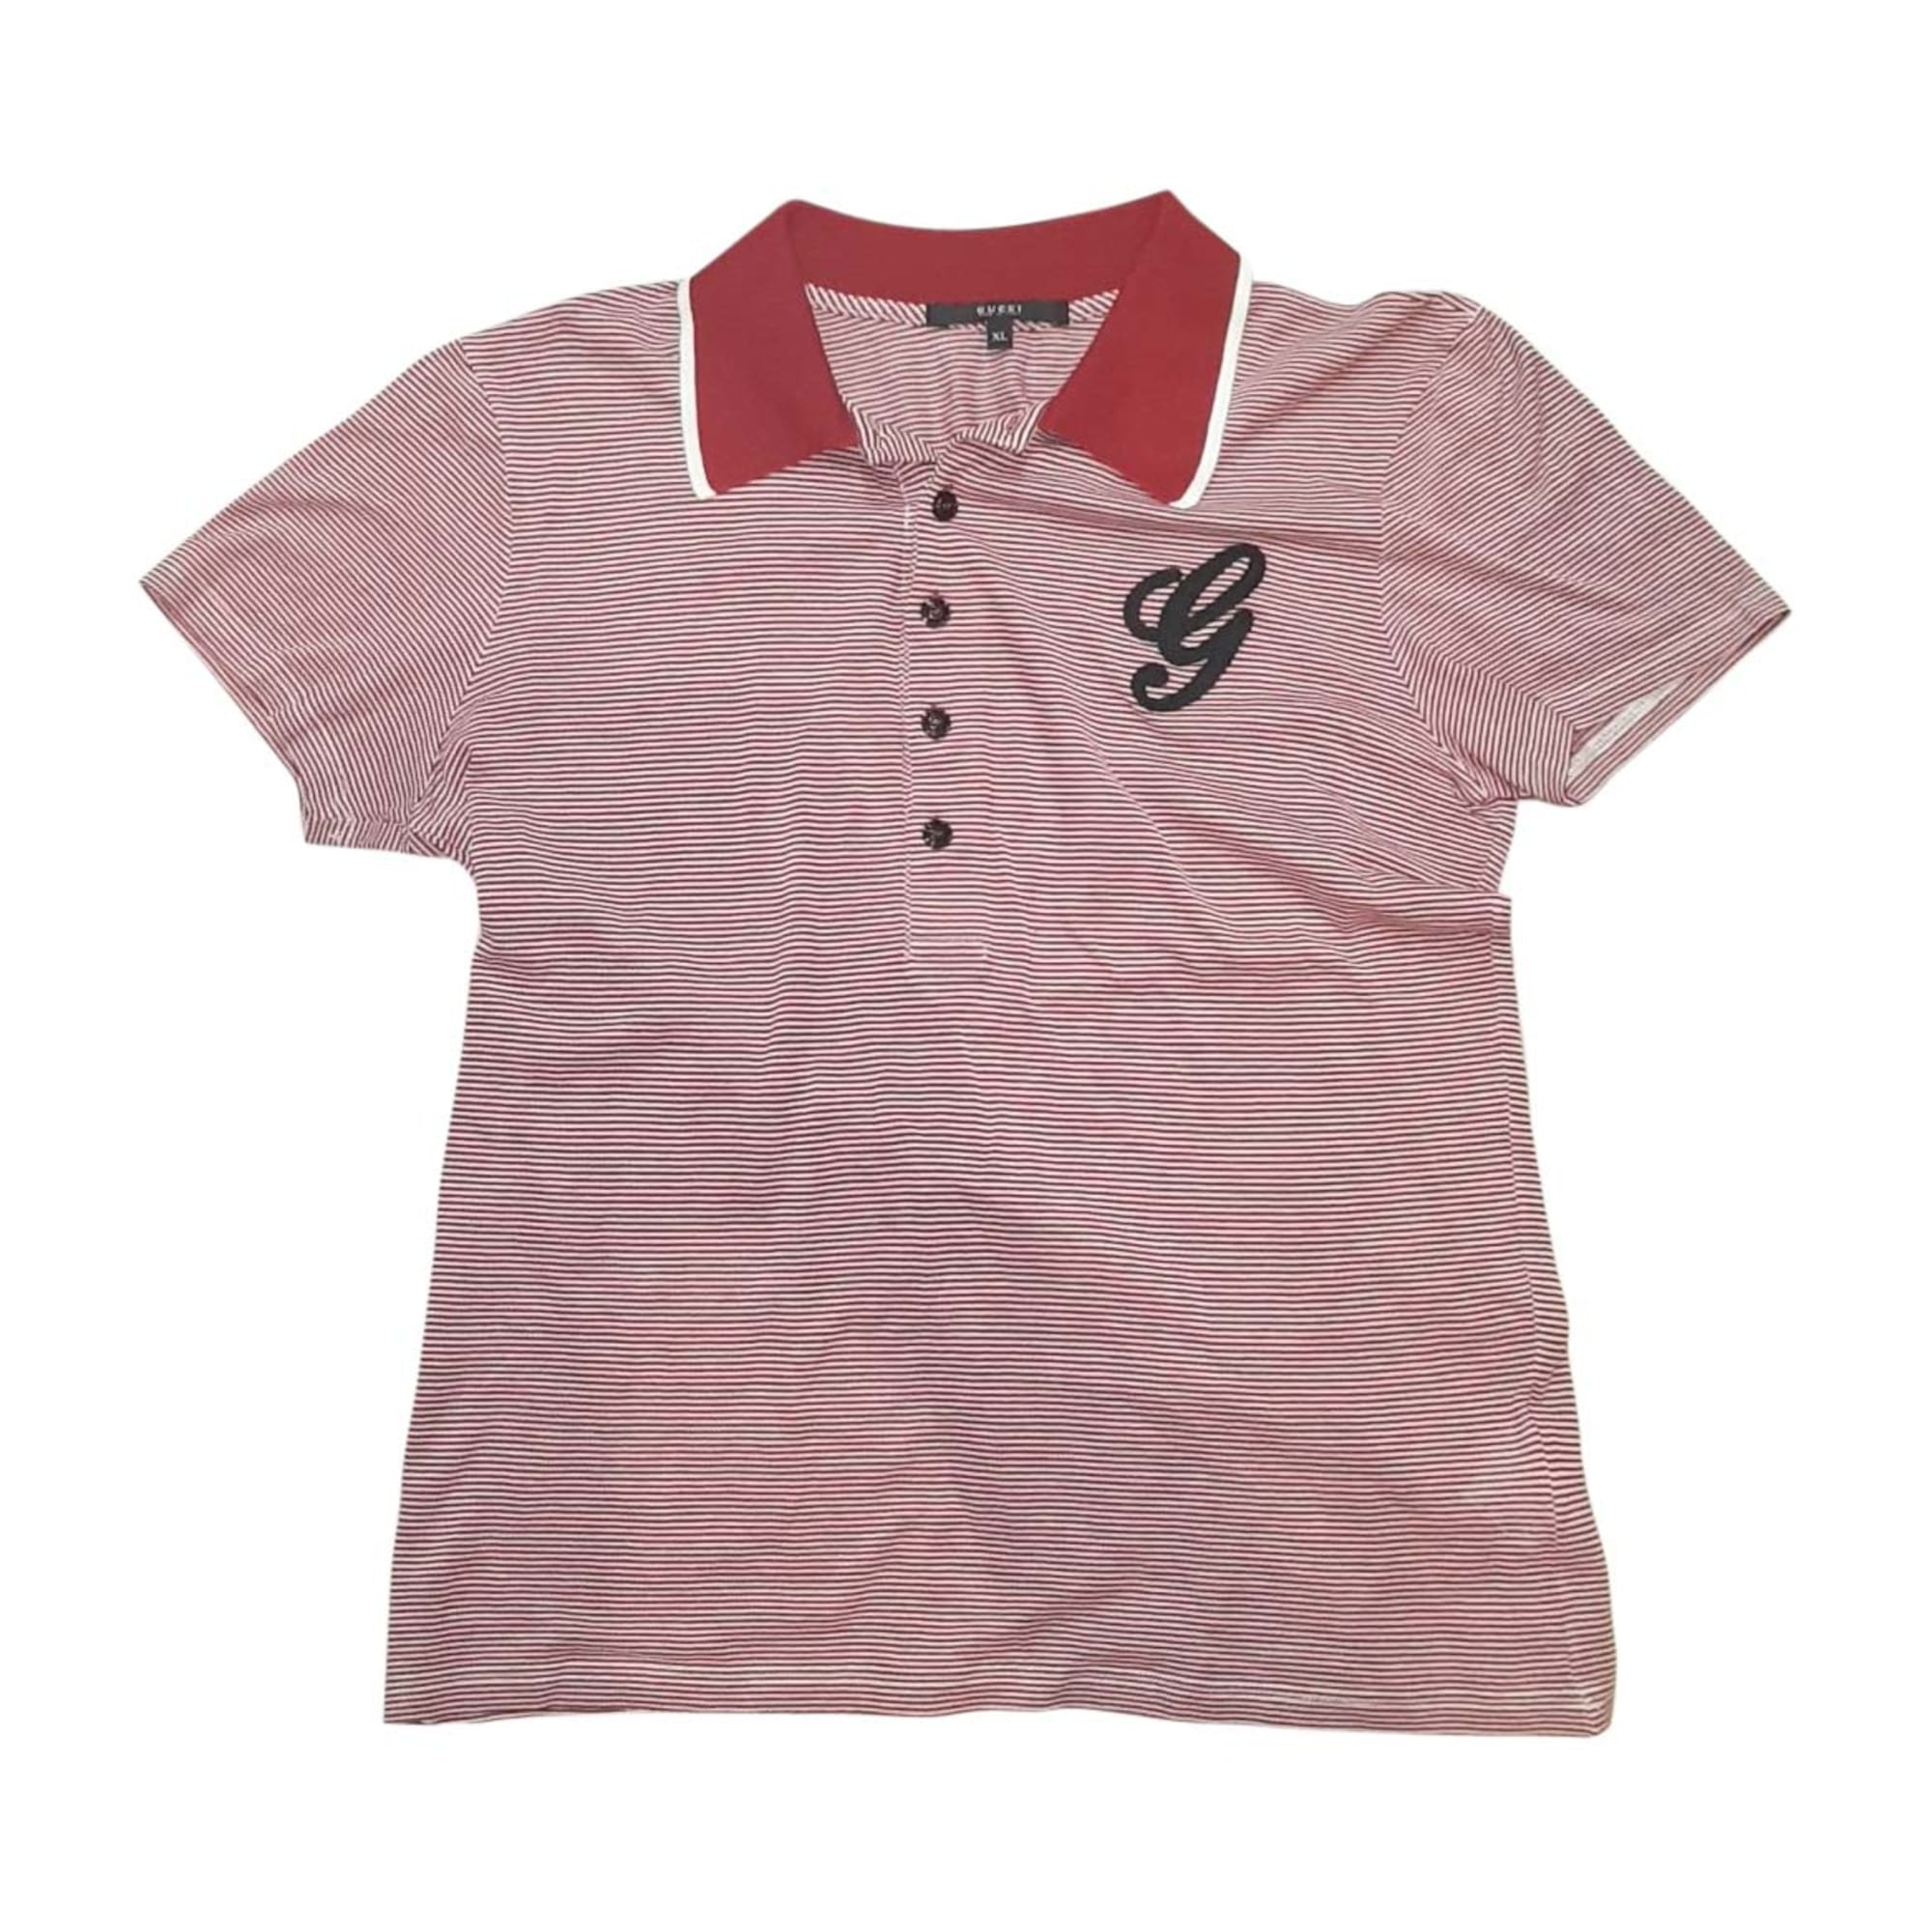 Polo GUCCI Pink, fuchsia, light pink